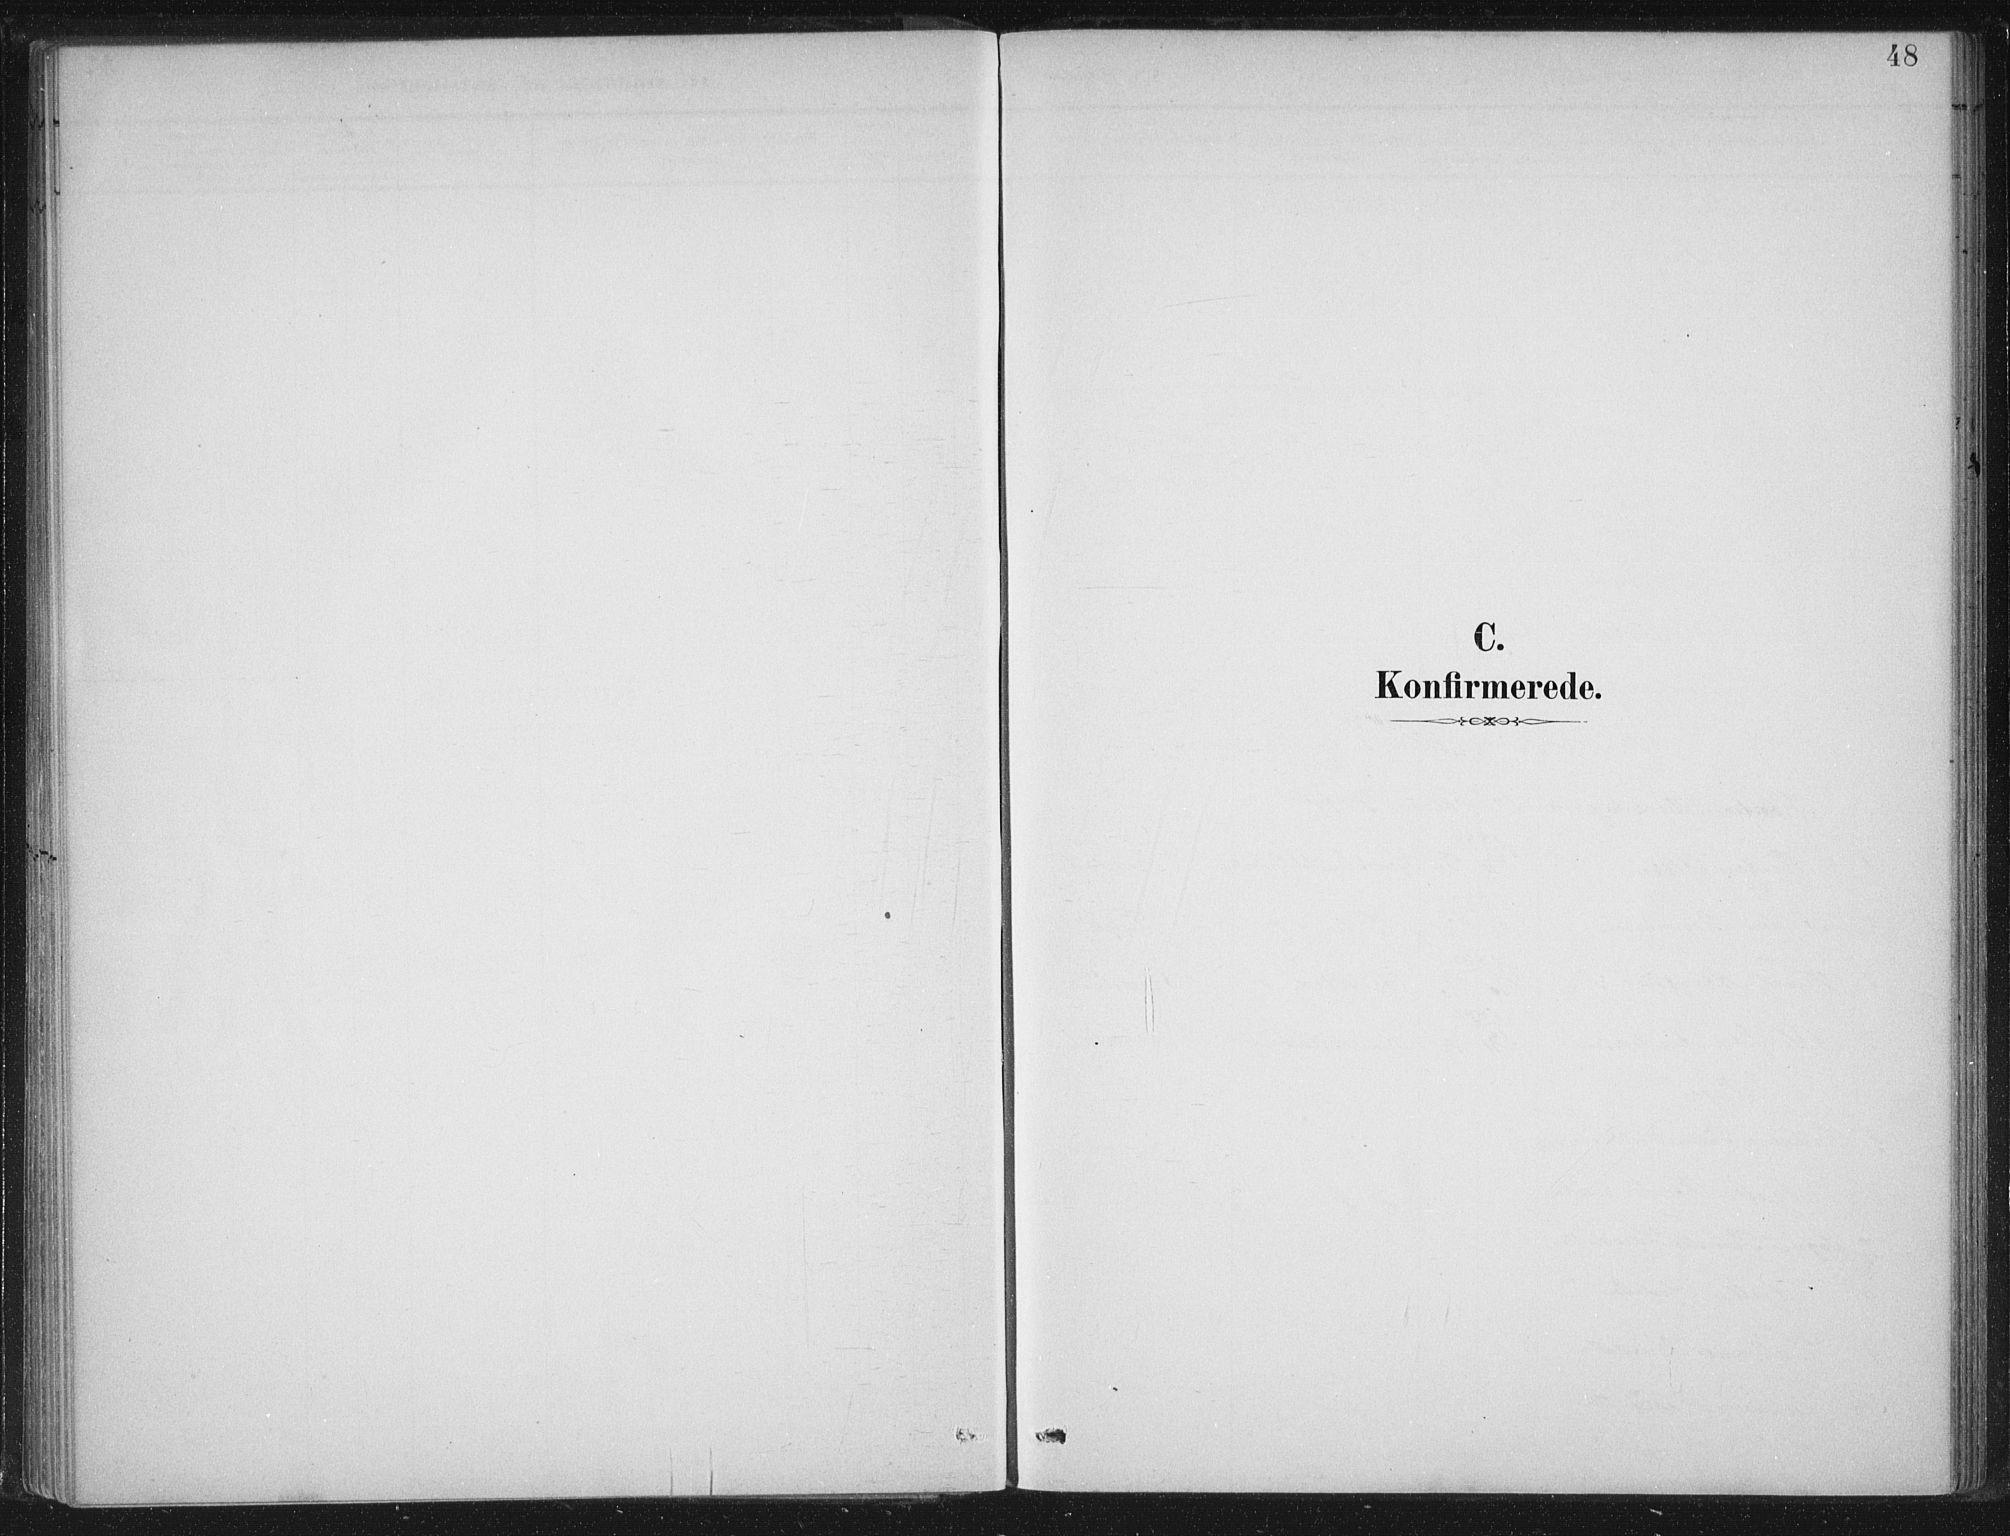 SAB, Gloppen sokneprestembete, H/Haa/Haad/L0001: Ministerialbok nr. D  1, 1885-1910, s. 48